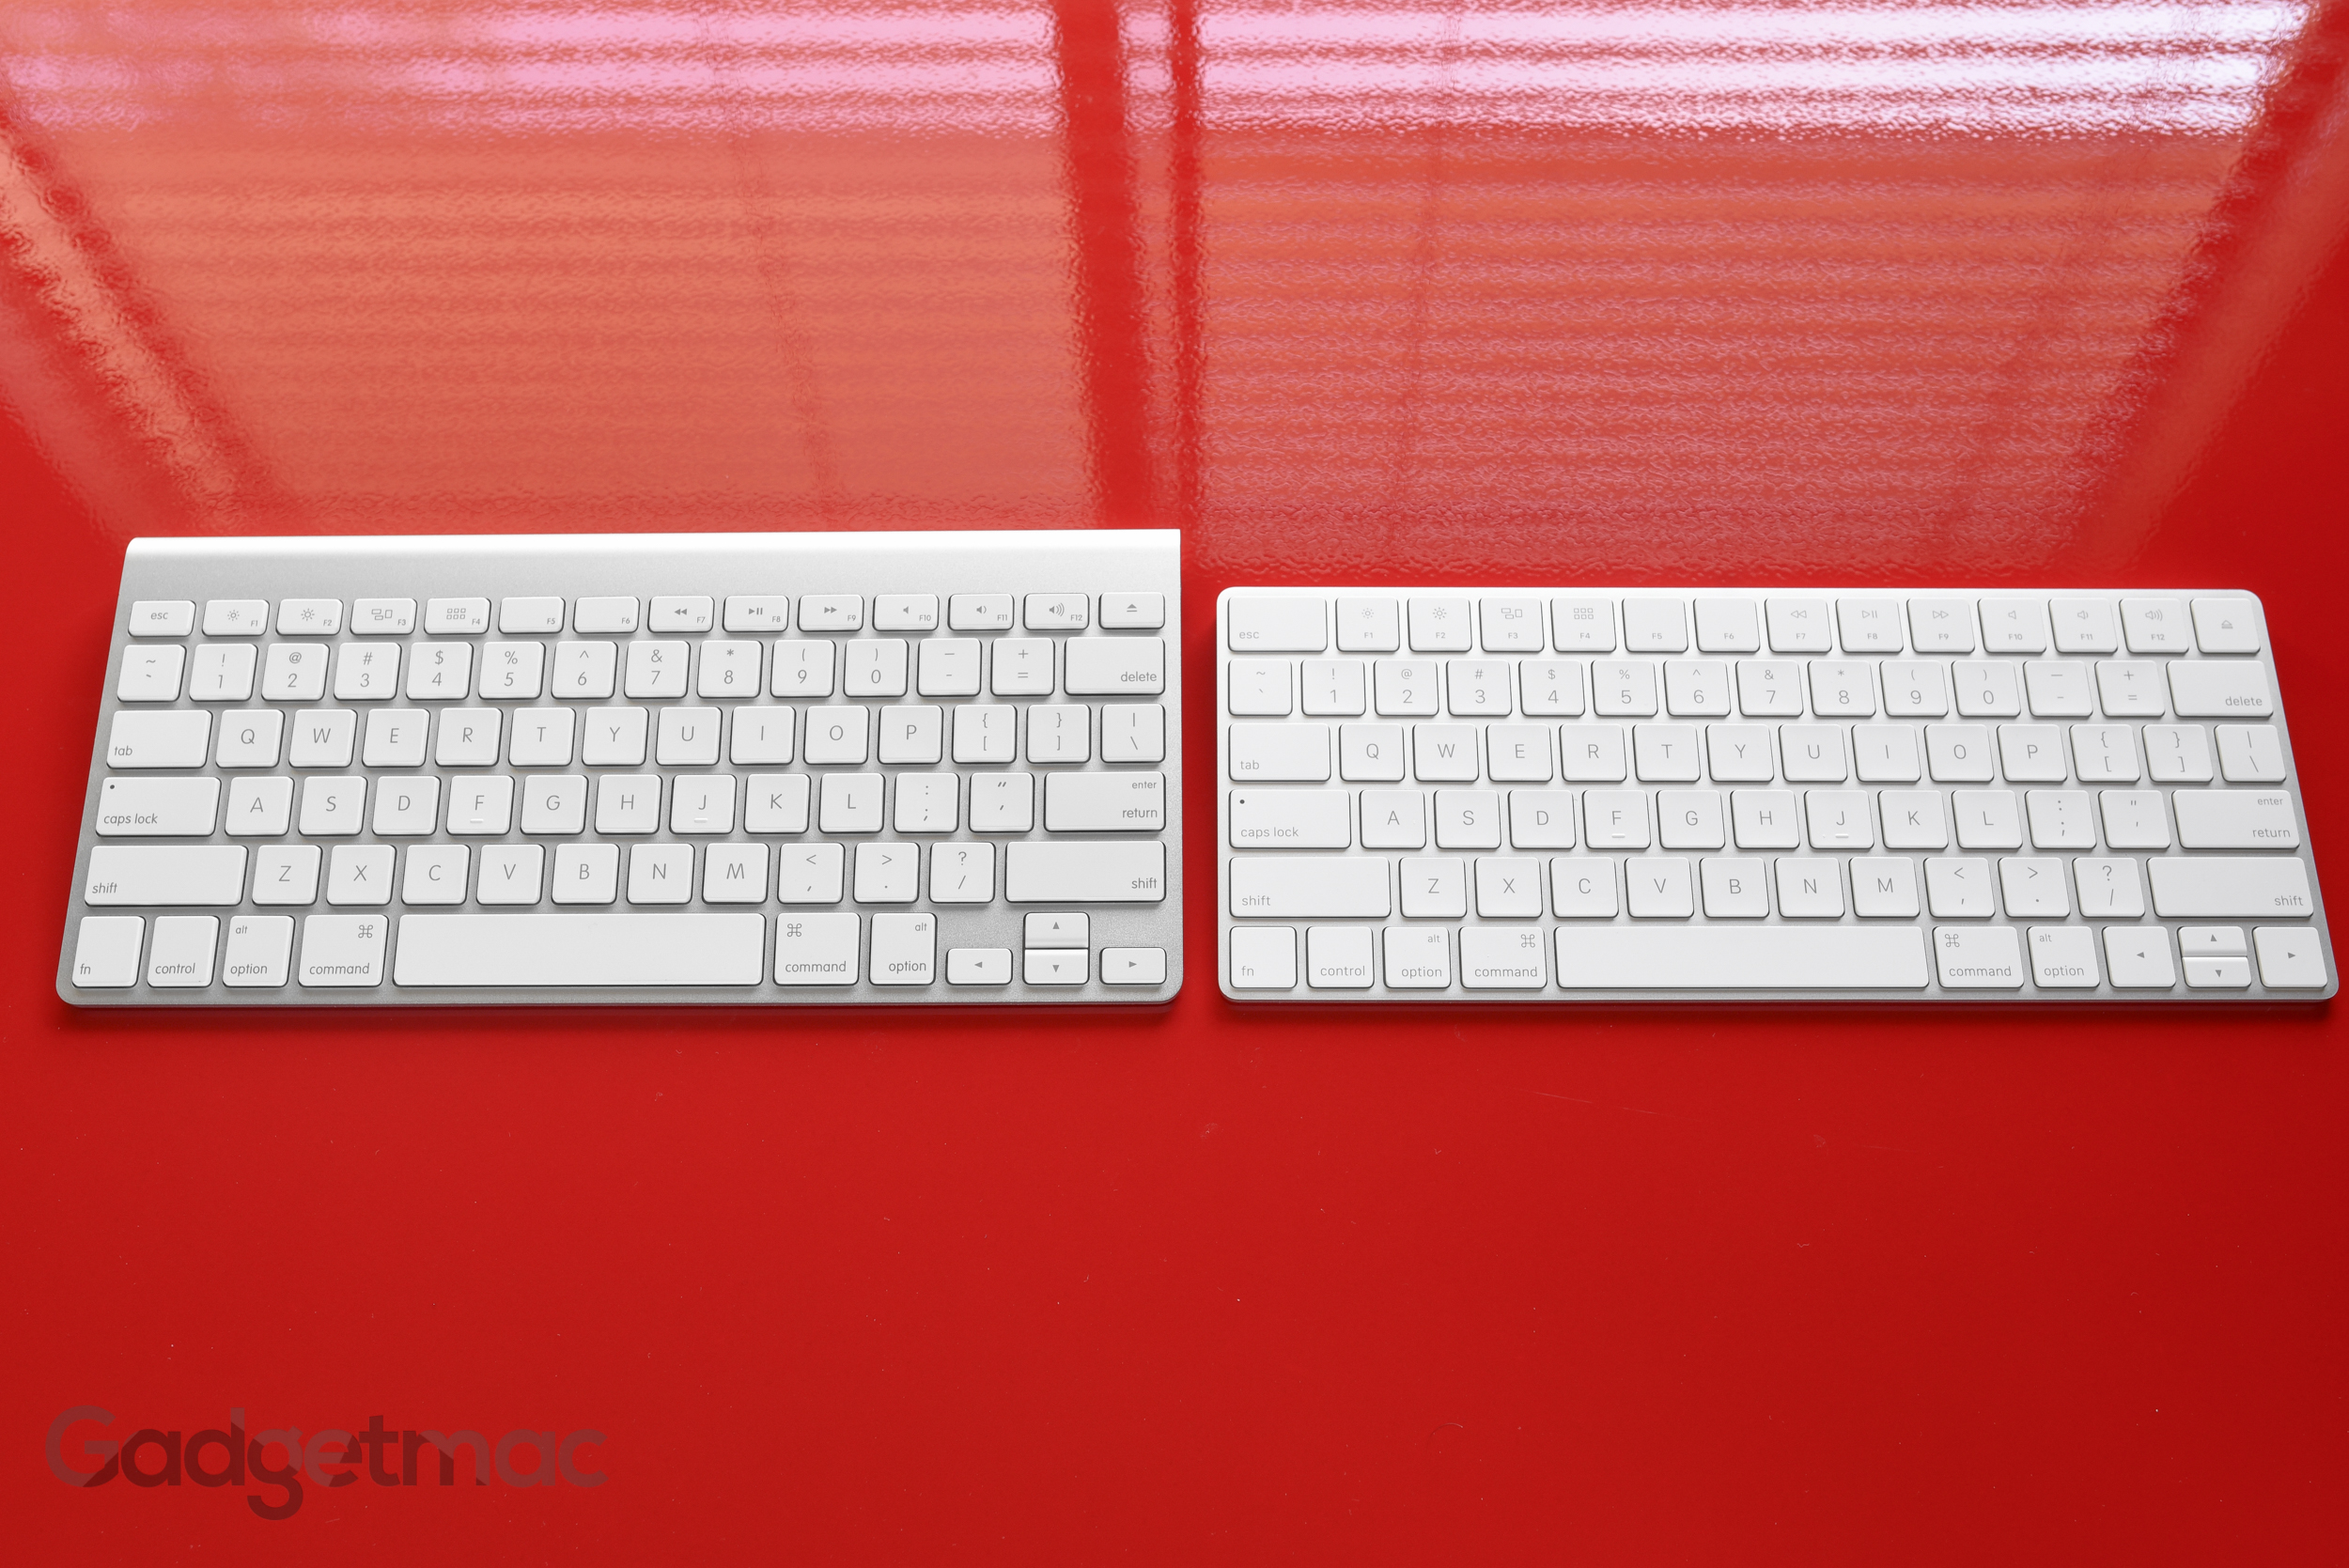 apple-magic-keyboard-wireless-bluetooth-comparison-size.jpg